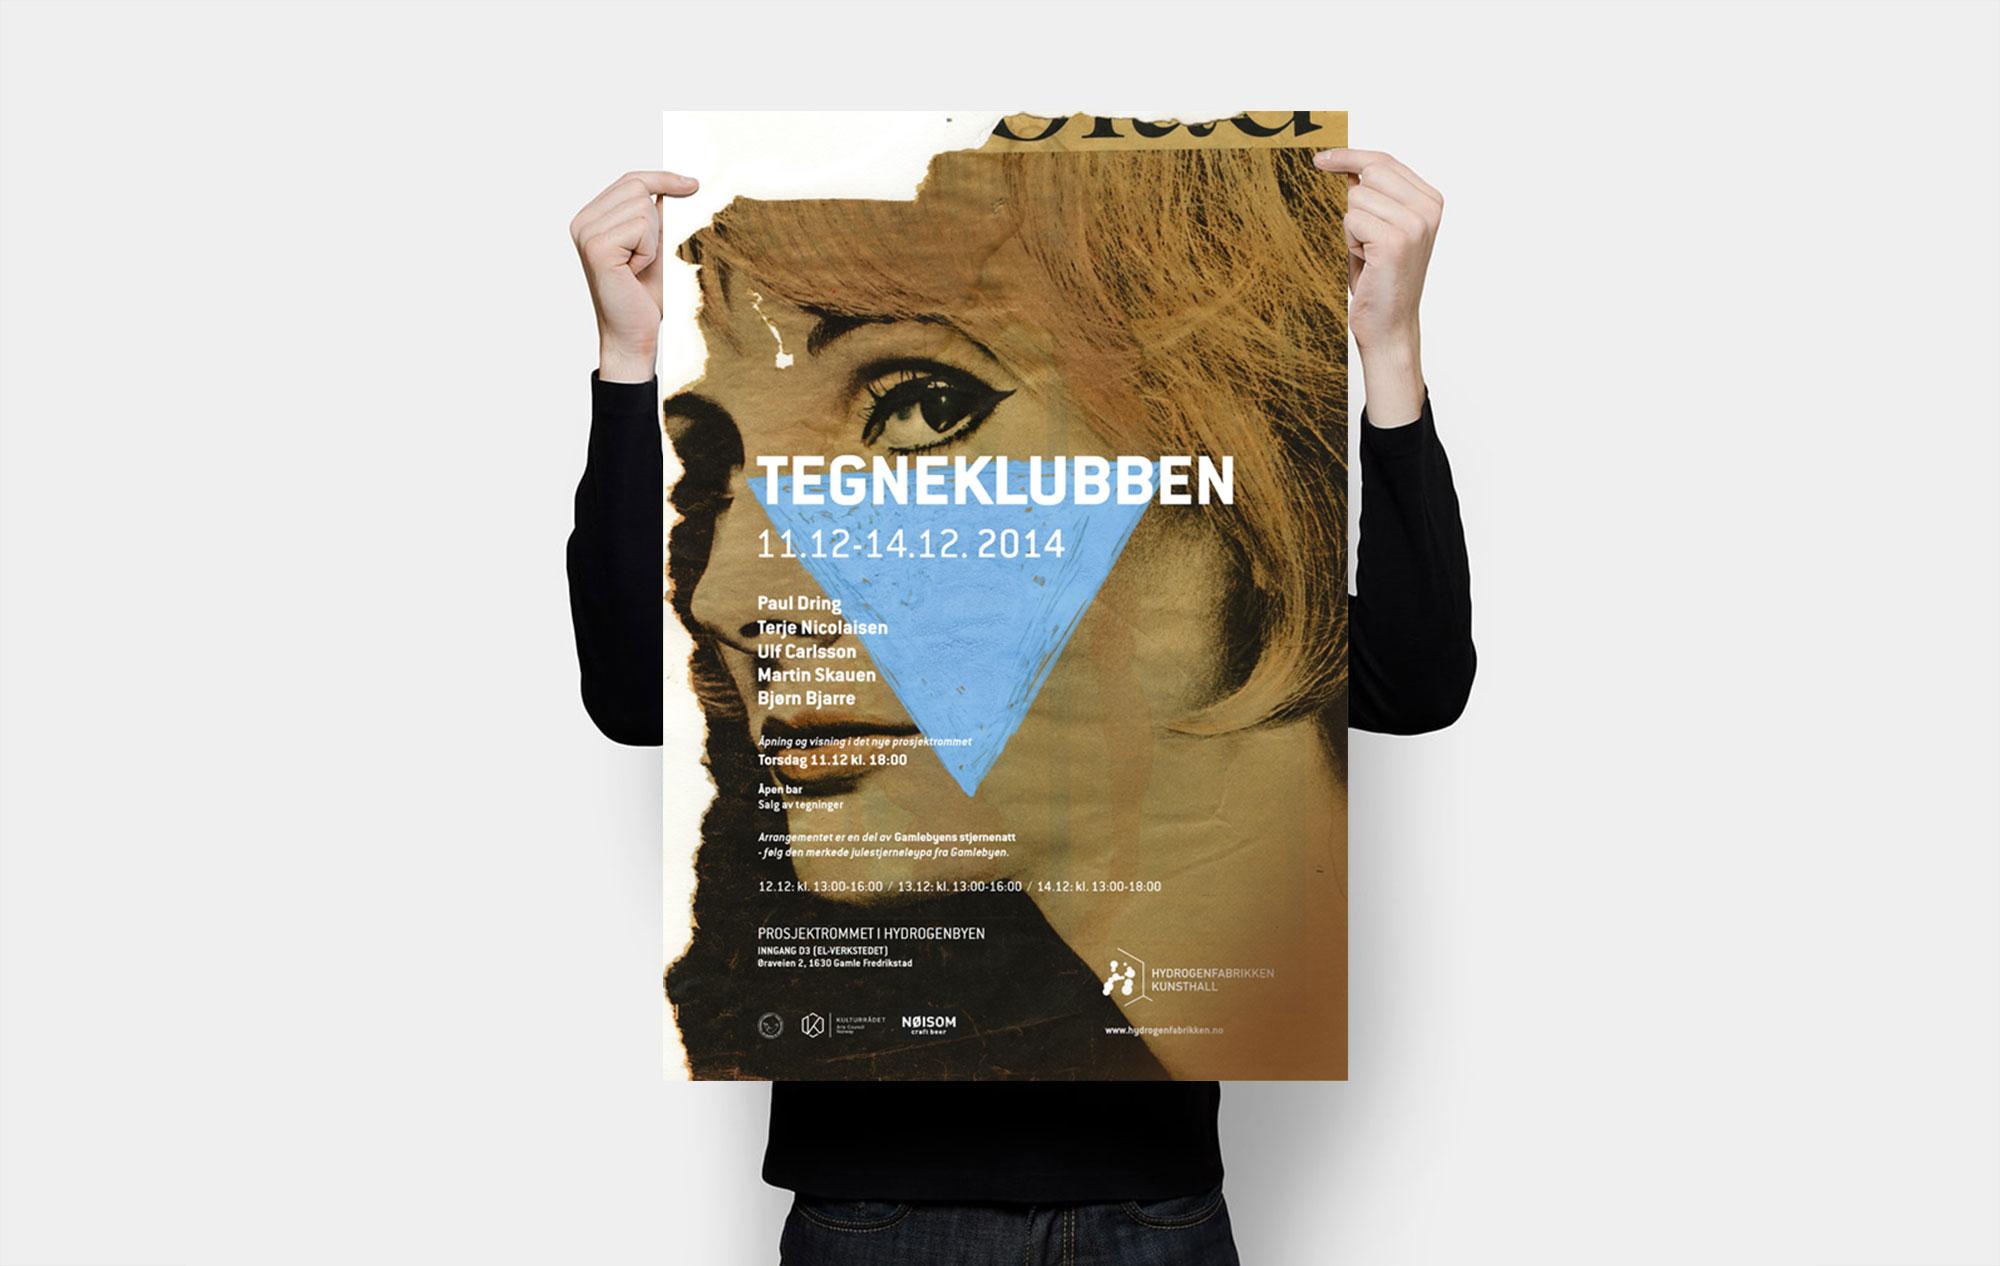 Tegneklubben Poster 1